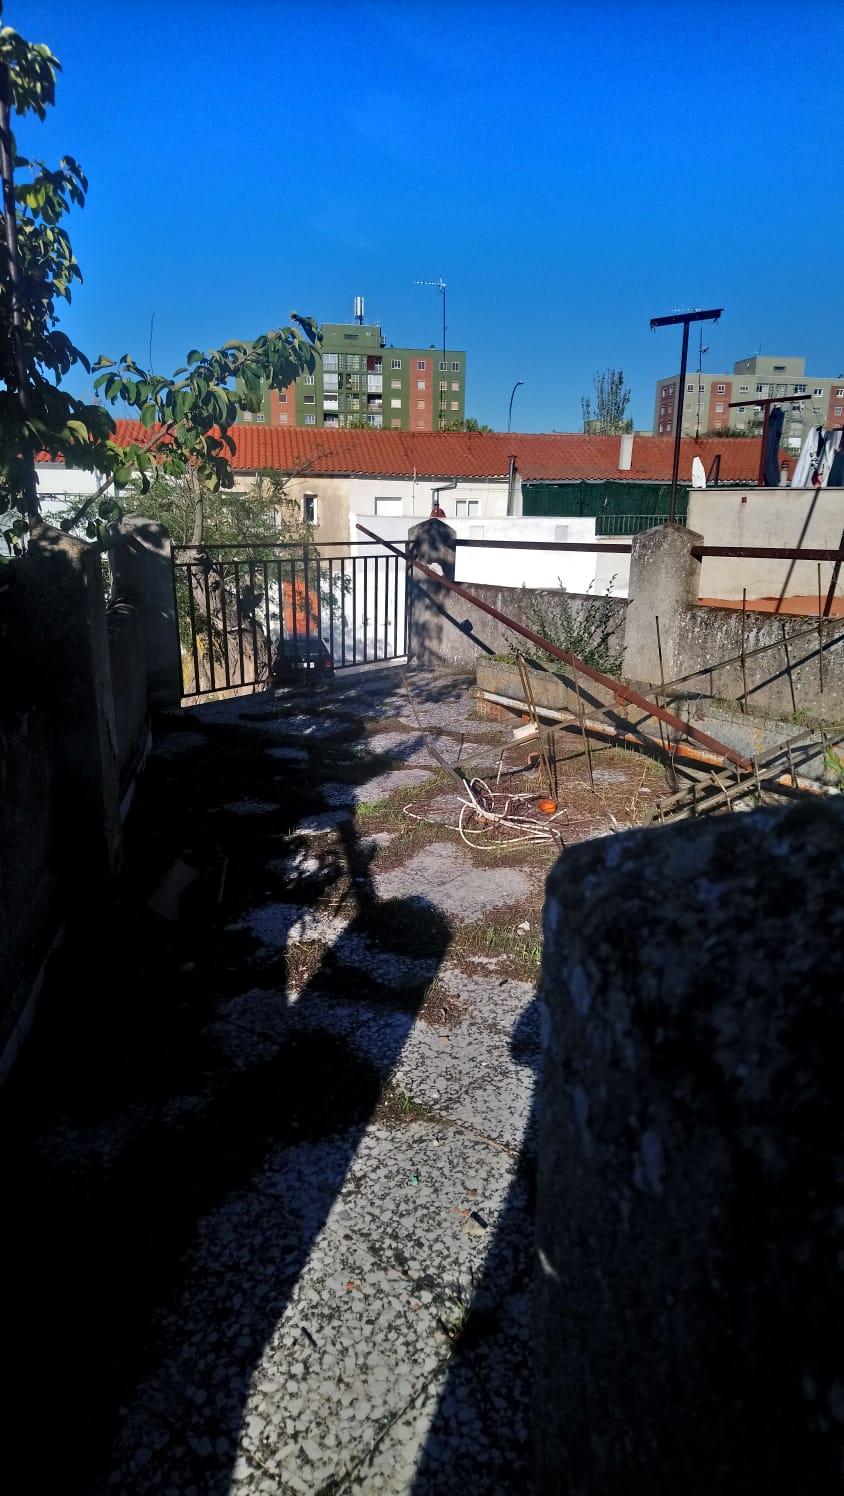 CASA CON GARAJE Y TERRAZA EN BARRIO DE LA VEGA (REF: 202) - foto 4 a9a1d332-7659-46bb-b311-81505e1fa96c.jpg